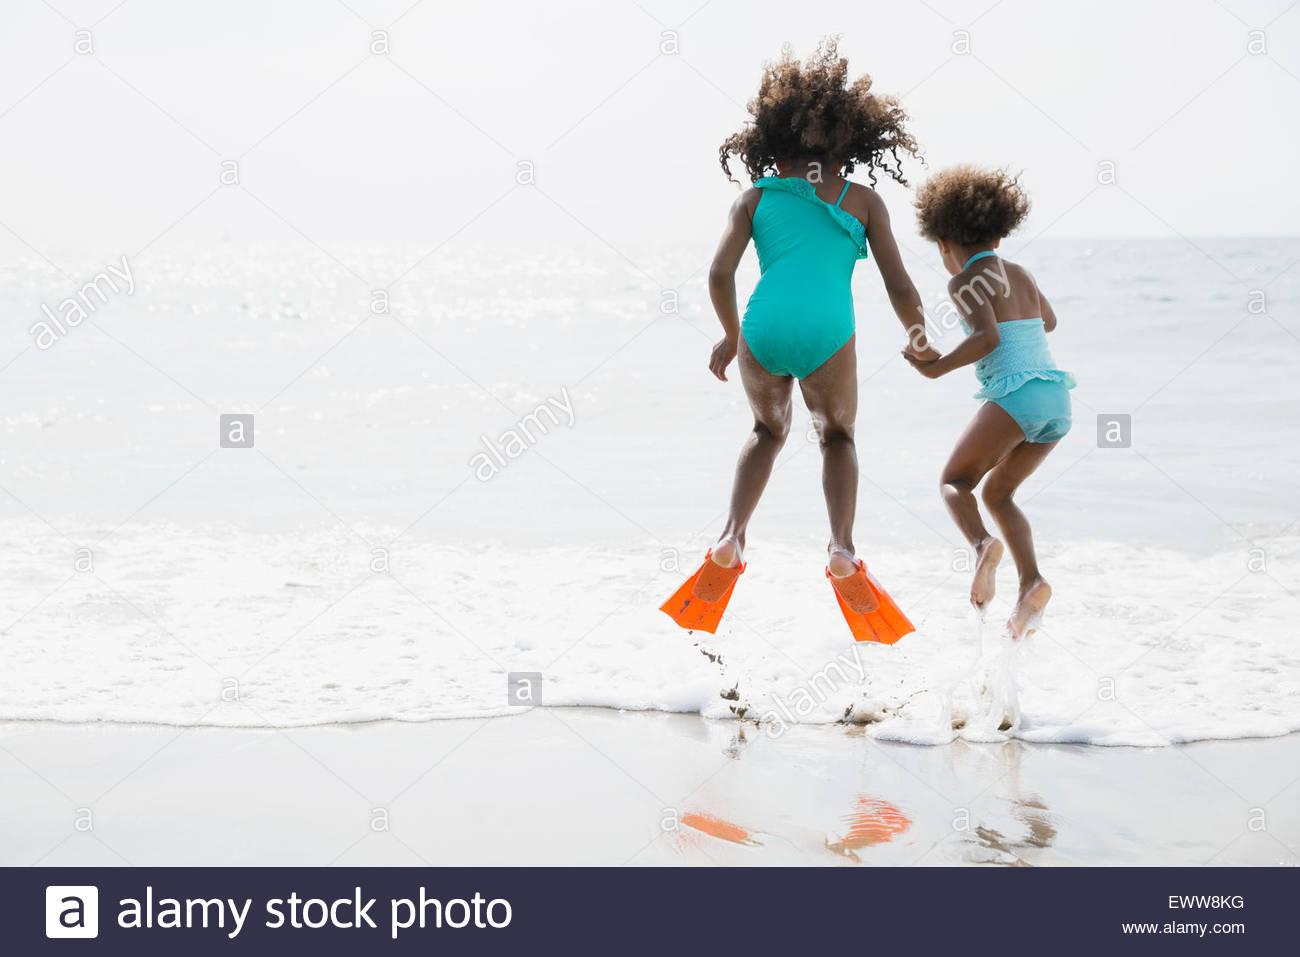 Sorelle in costume da saltare in ocean surf Immagini Stock